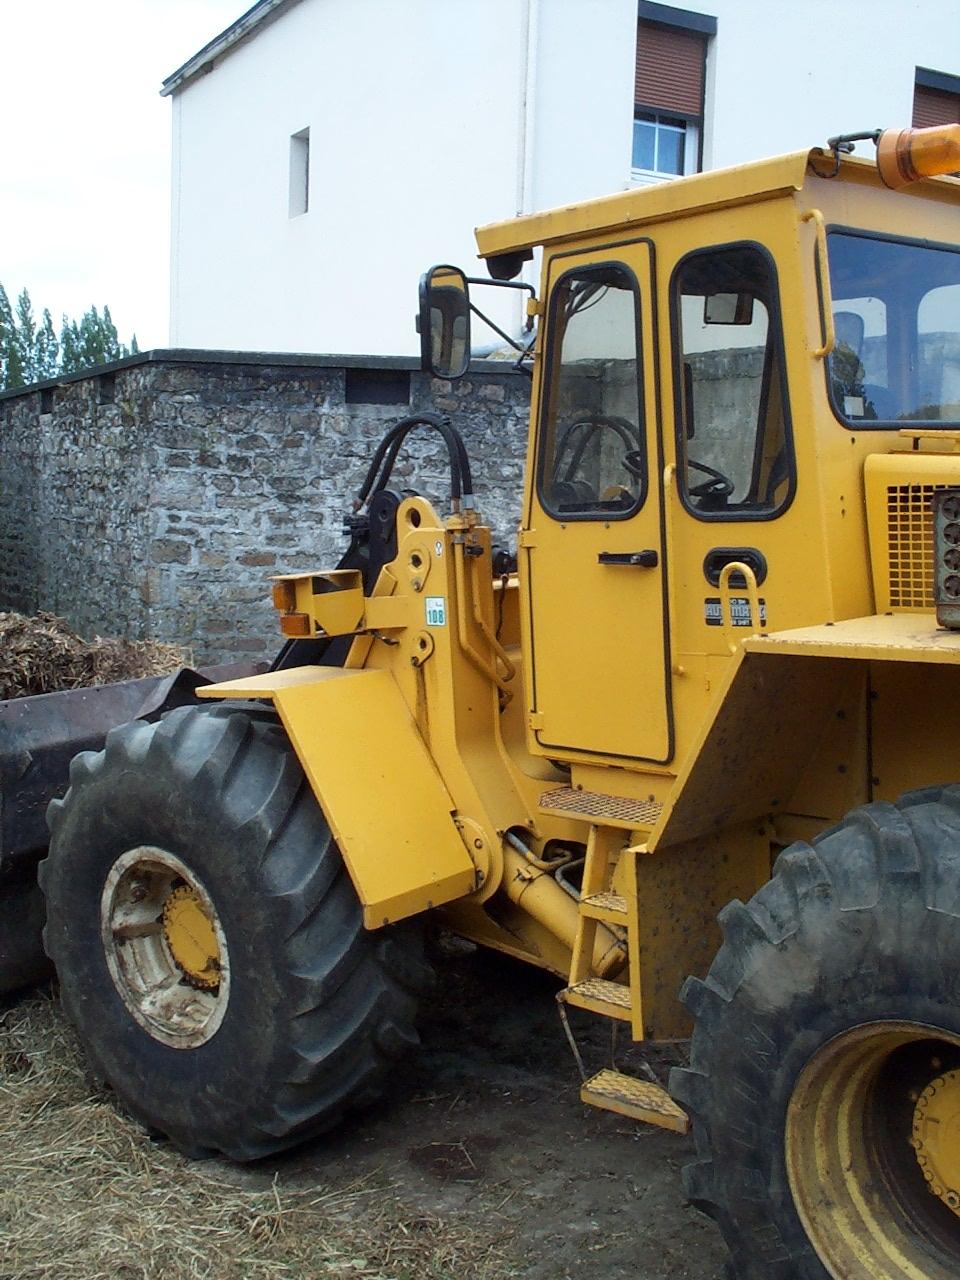 AWH Utilities buys Volvo excavators - Construction News